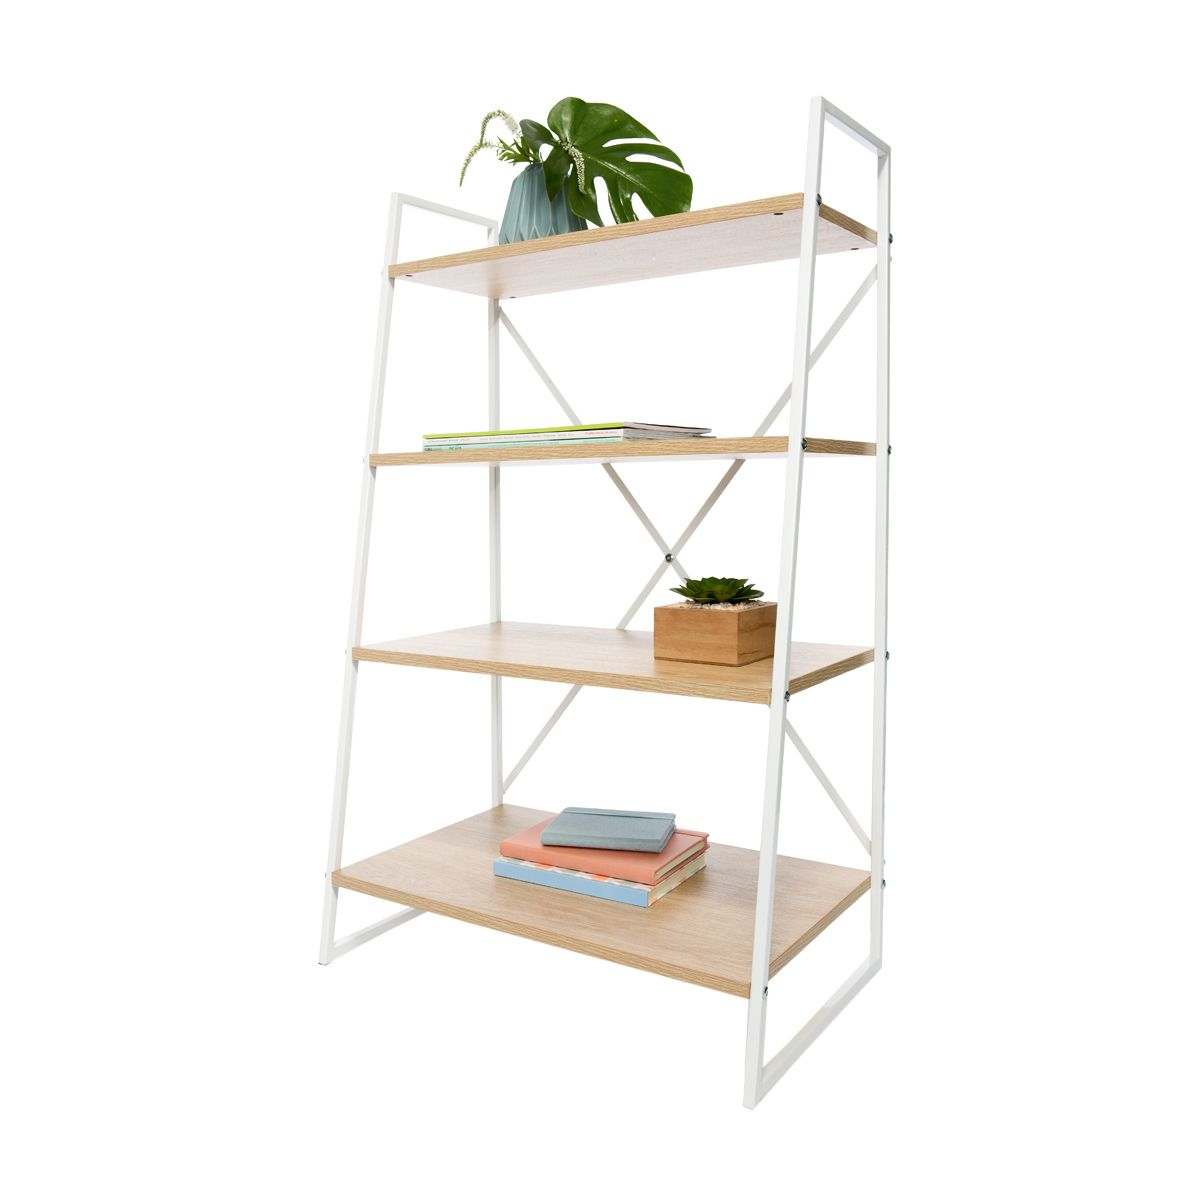 Scandi ladder bookshelf kmart hxwxd furniture